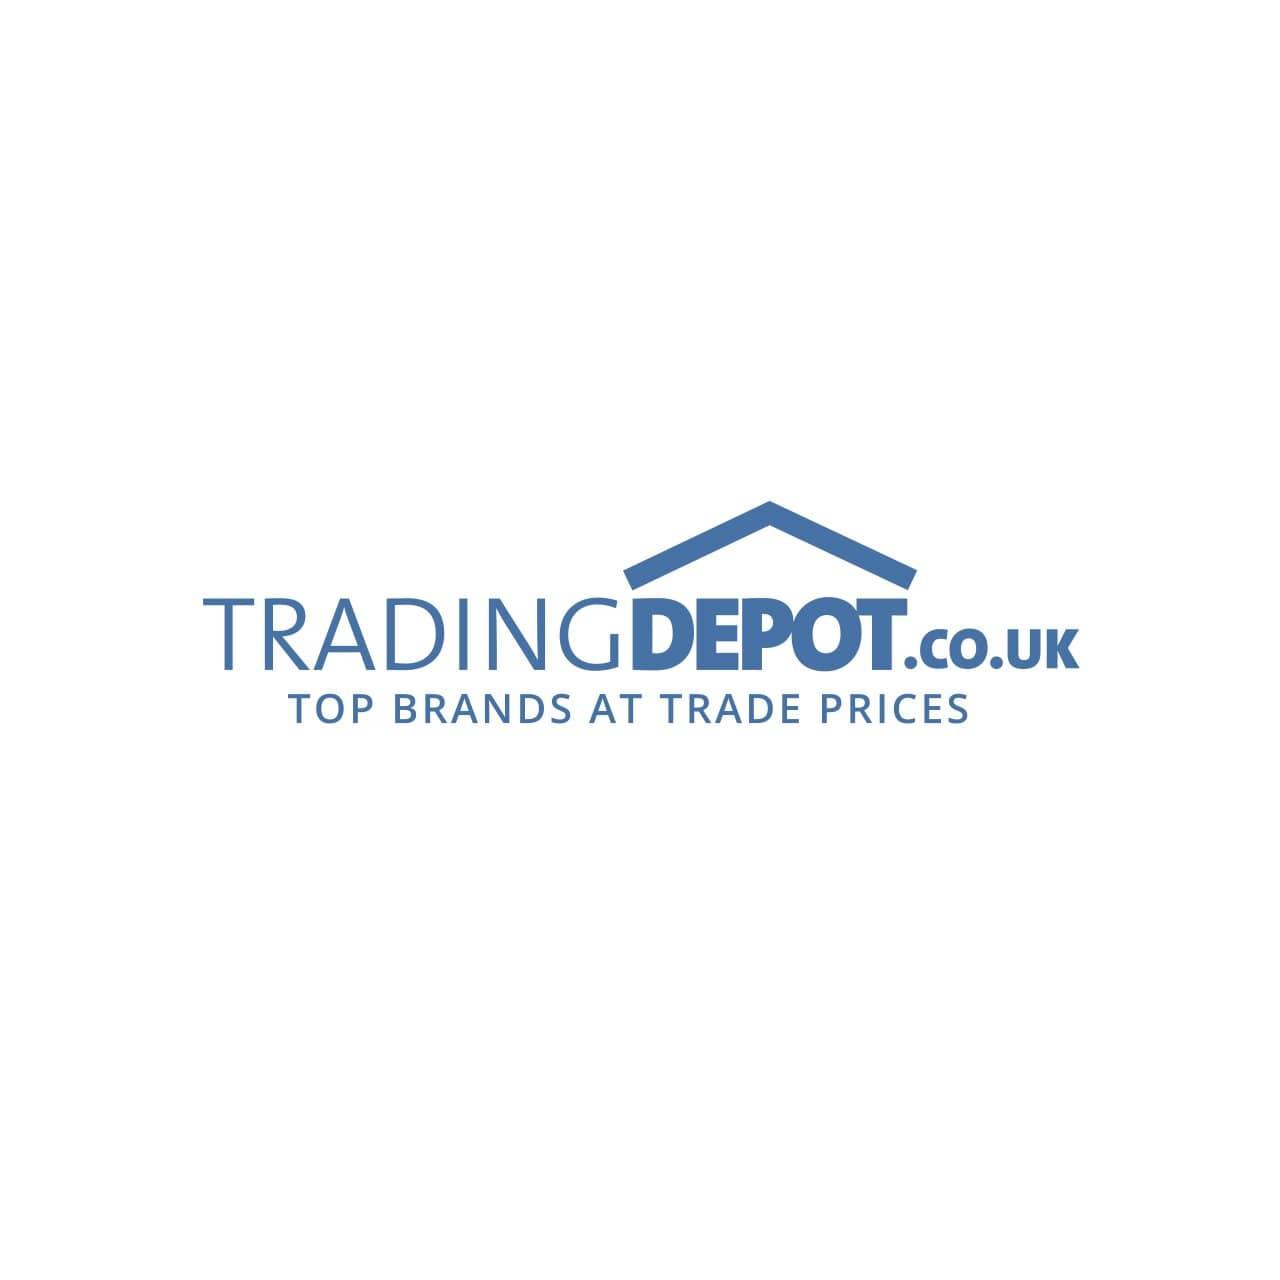 Britool Expert E160803 Stubby Ratchet Bit Holder & Bits - BRIE160803B